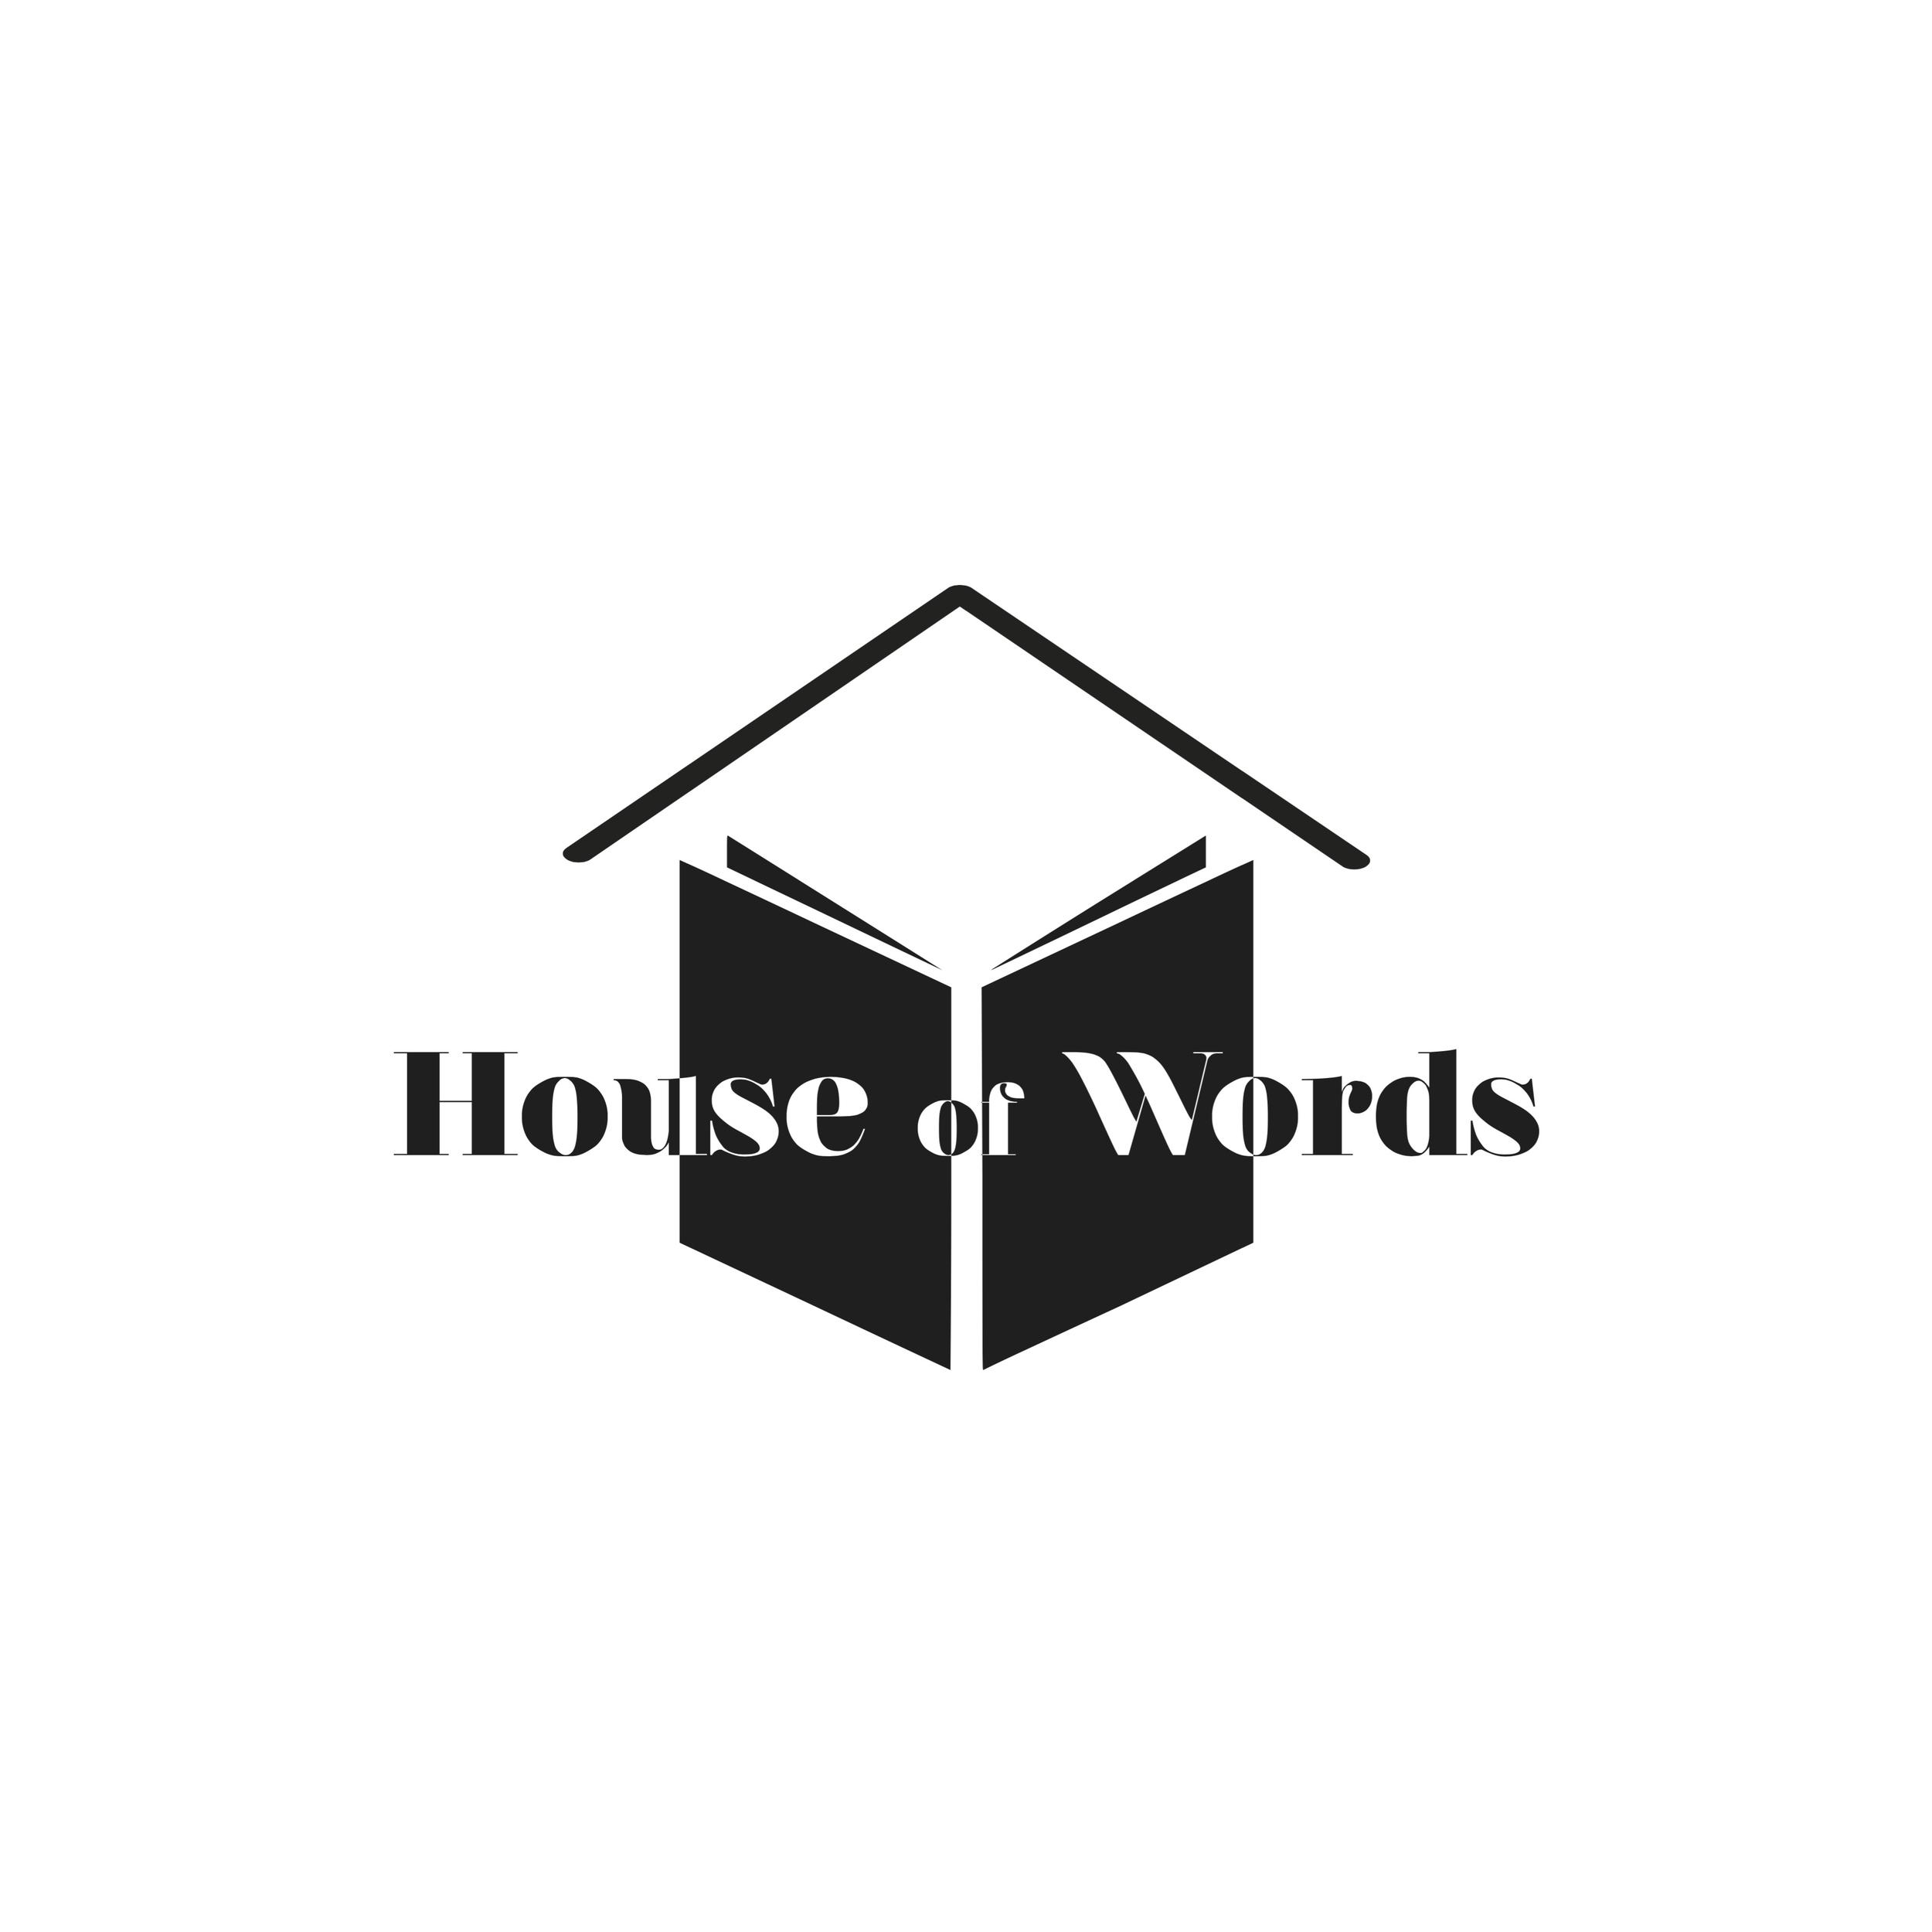 """House of Words"" - Logo (online Blog)"